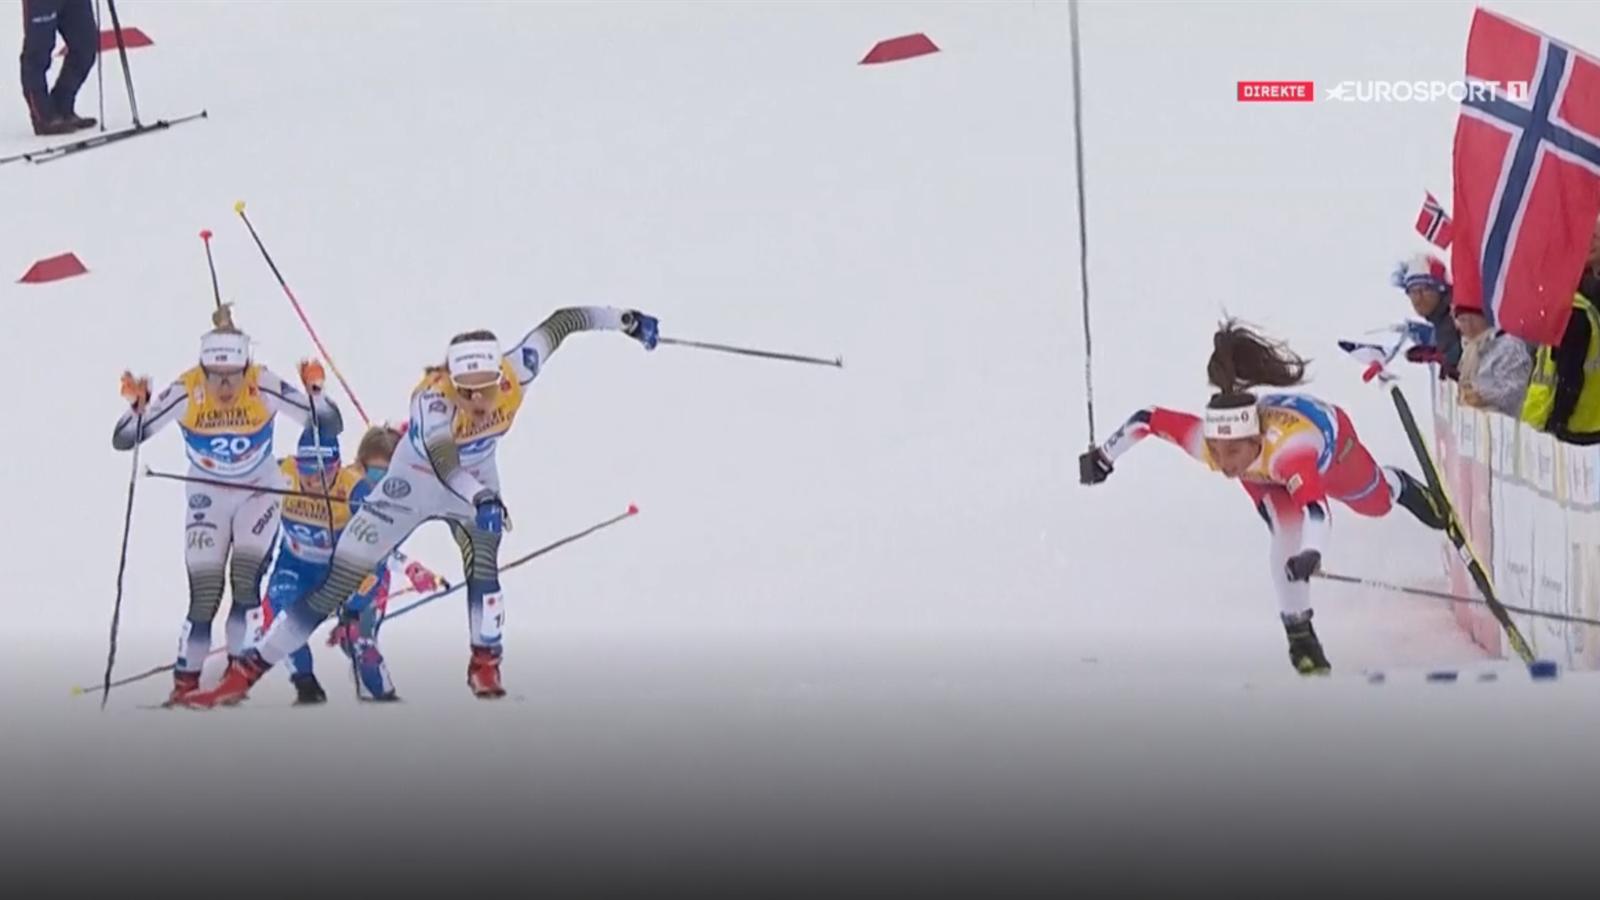 Kristine stavås skistad høyde